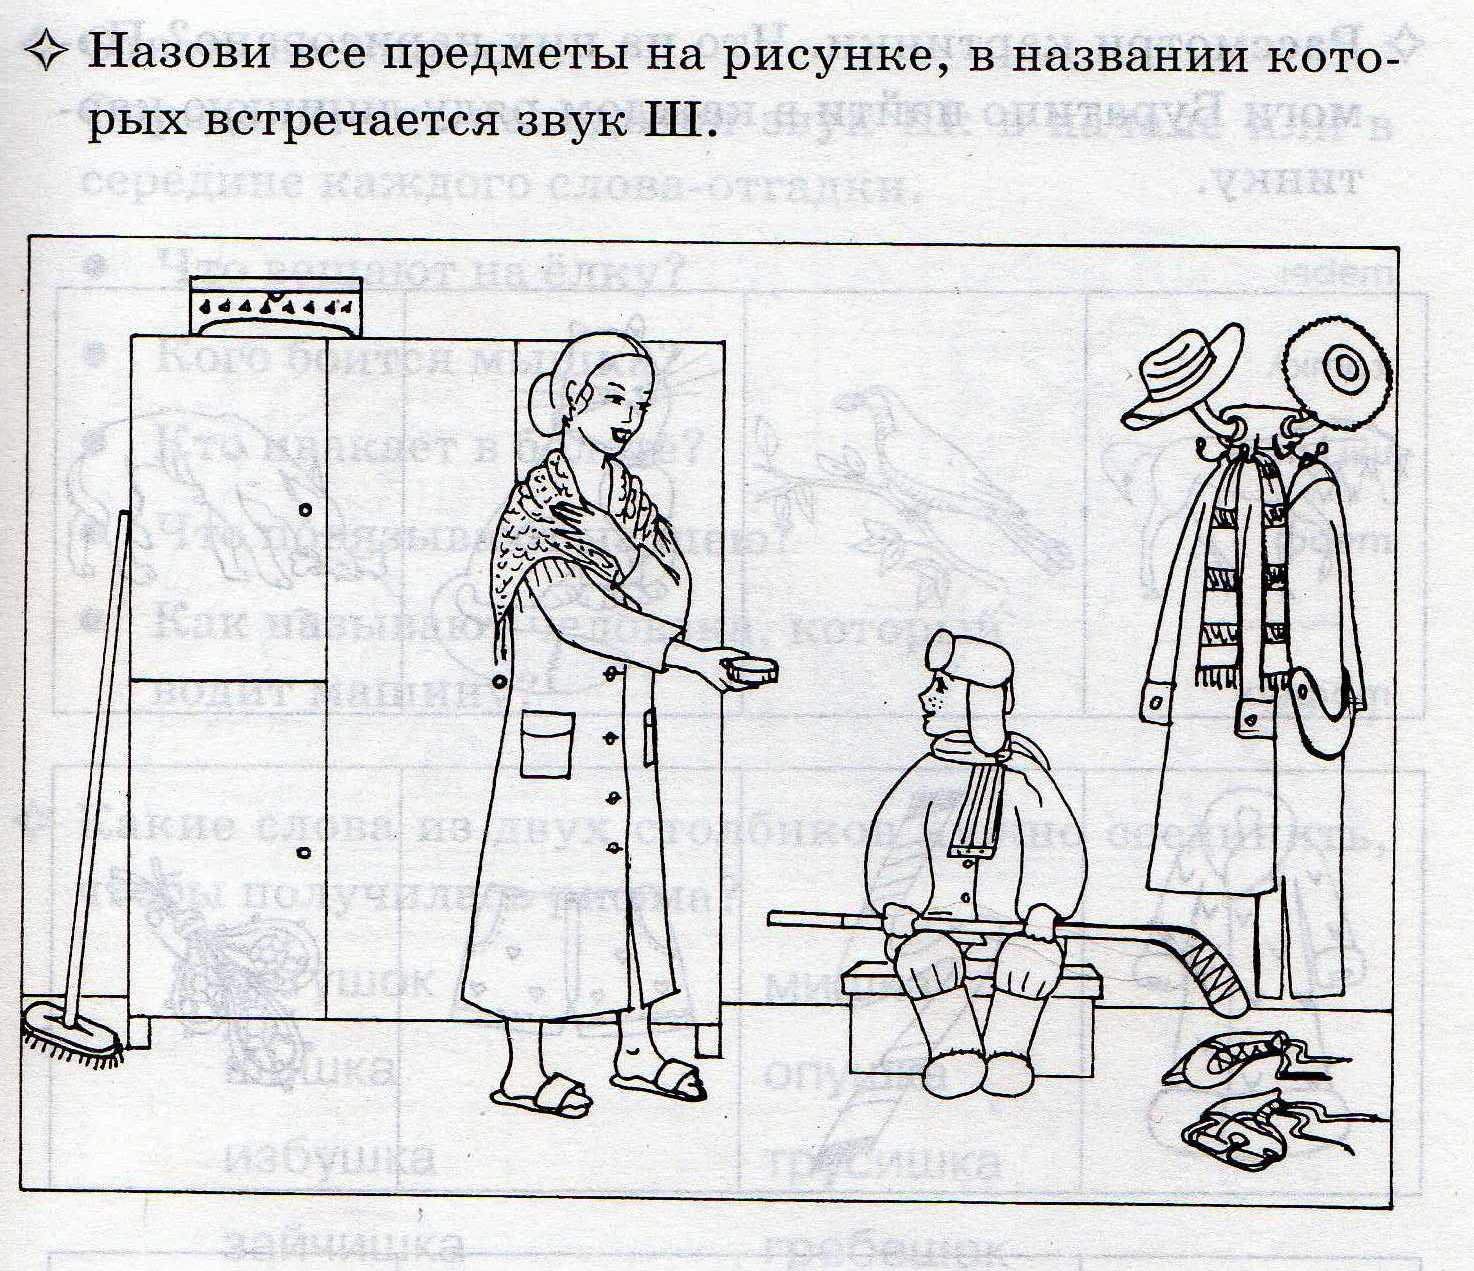 C:\Documents and Settings\Администратор\Рабочий стол\img071.jpg